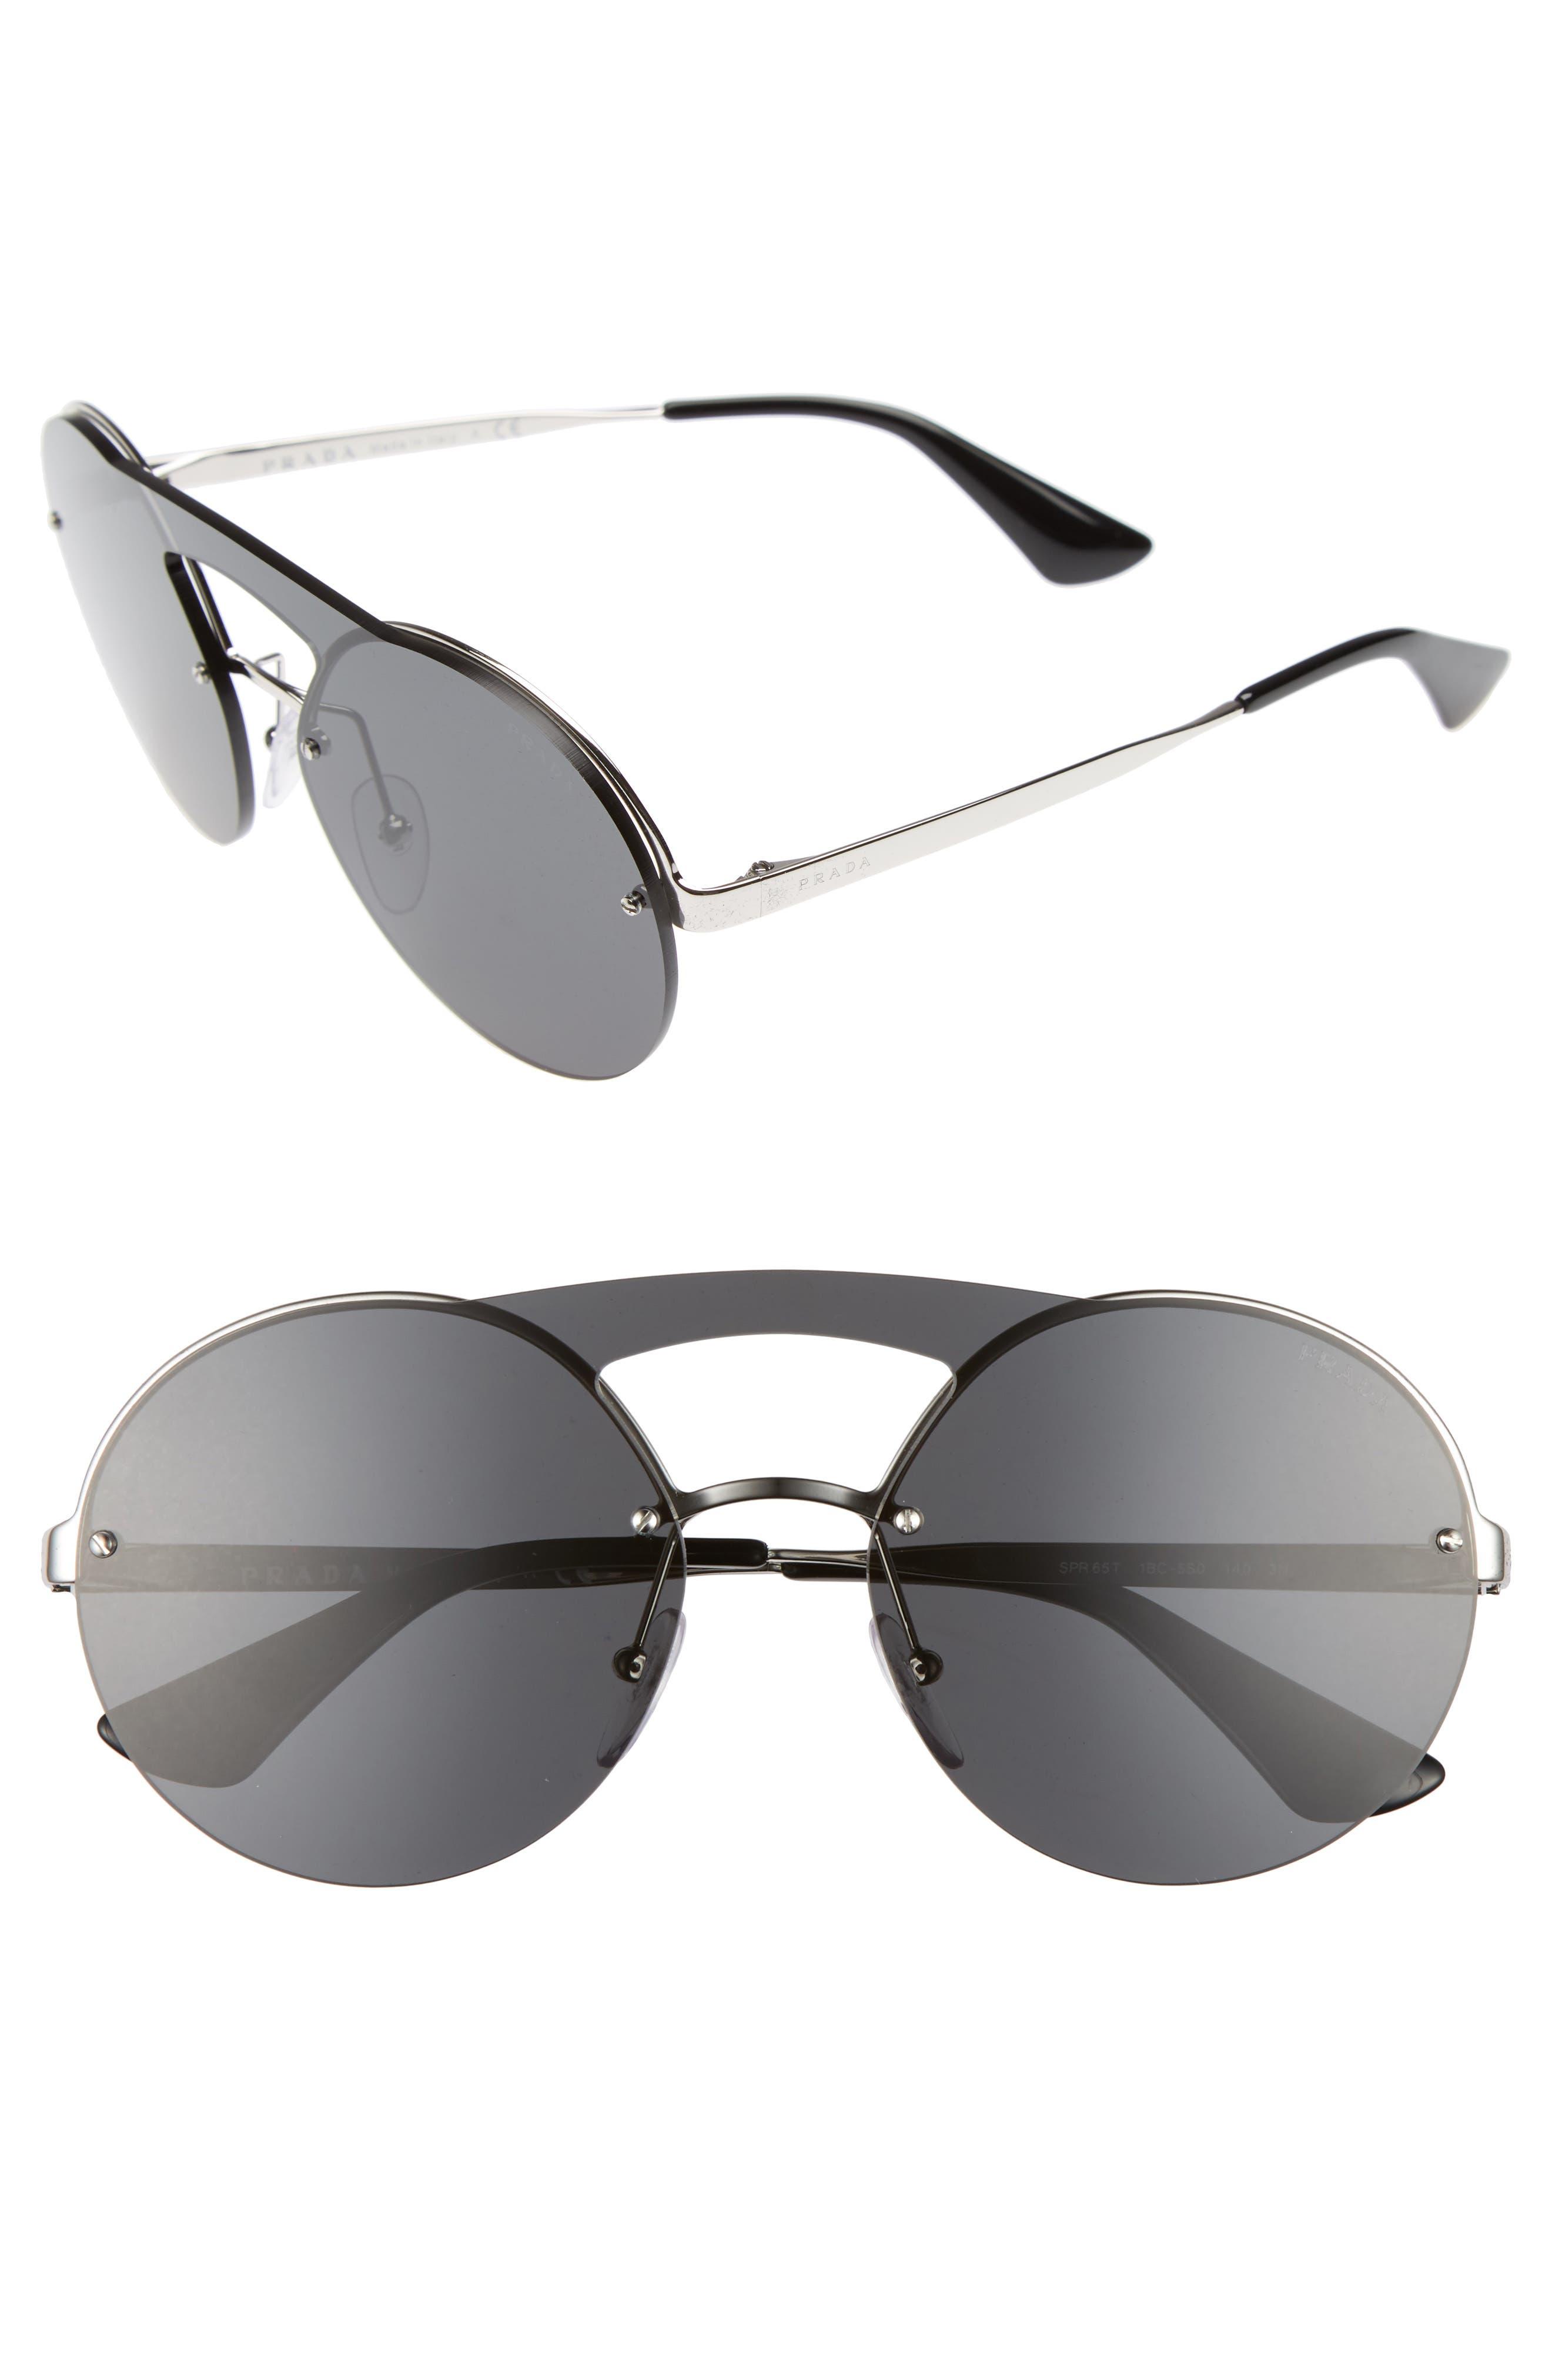 Prada 60mm Round Rimless Sunglasses